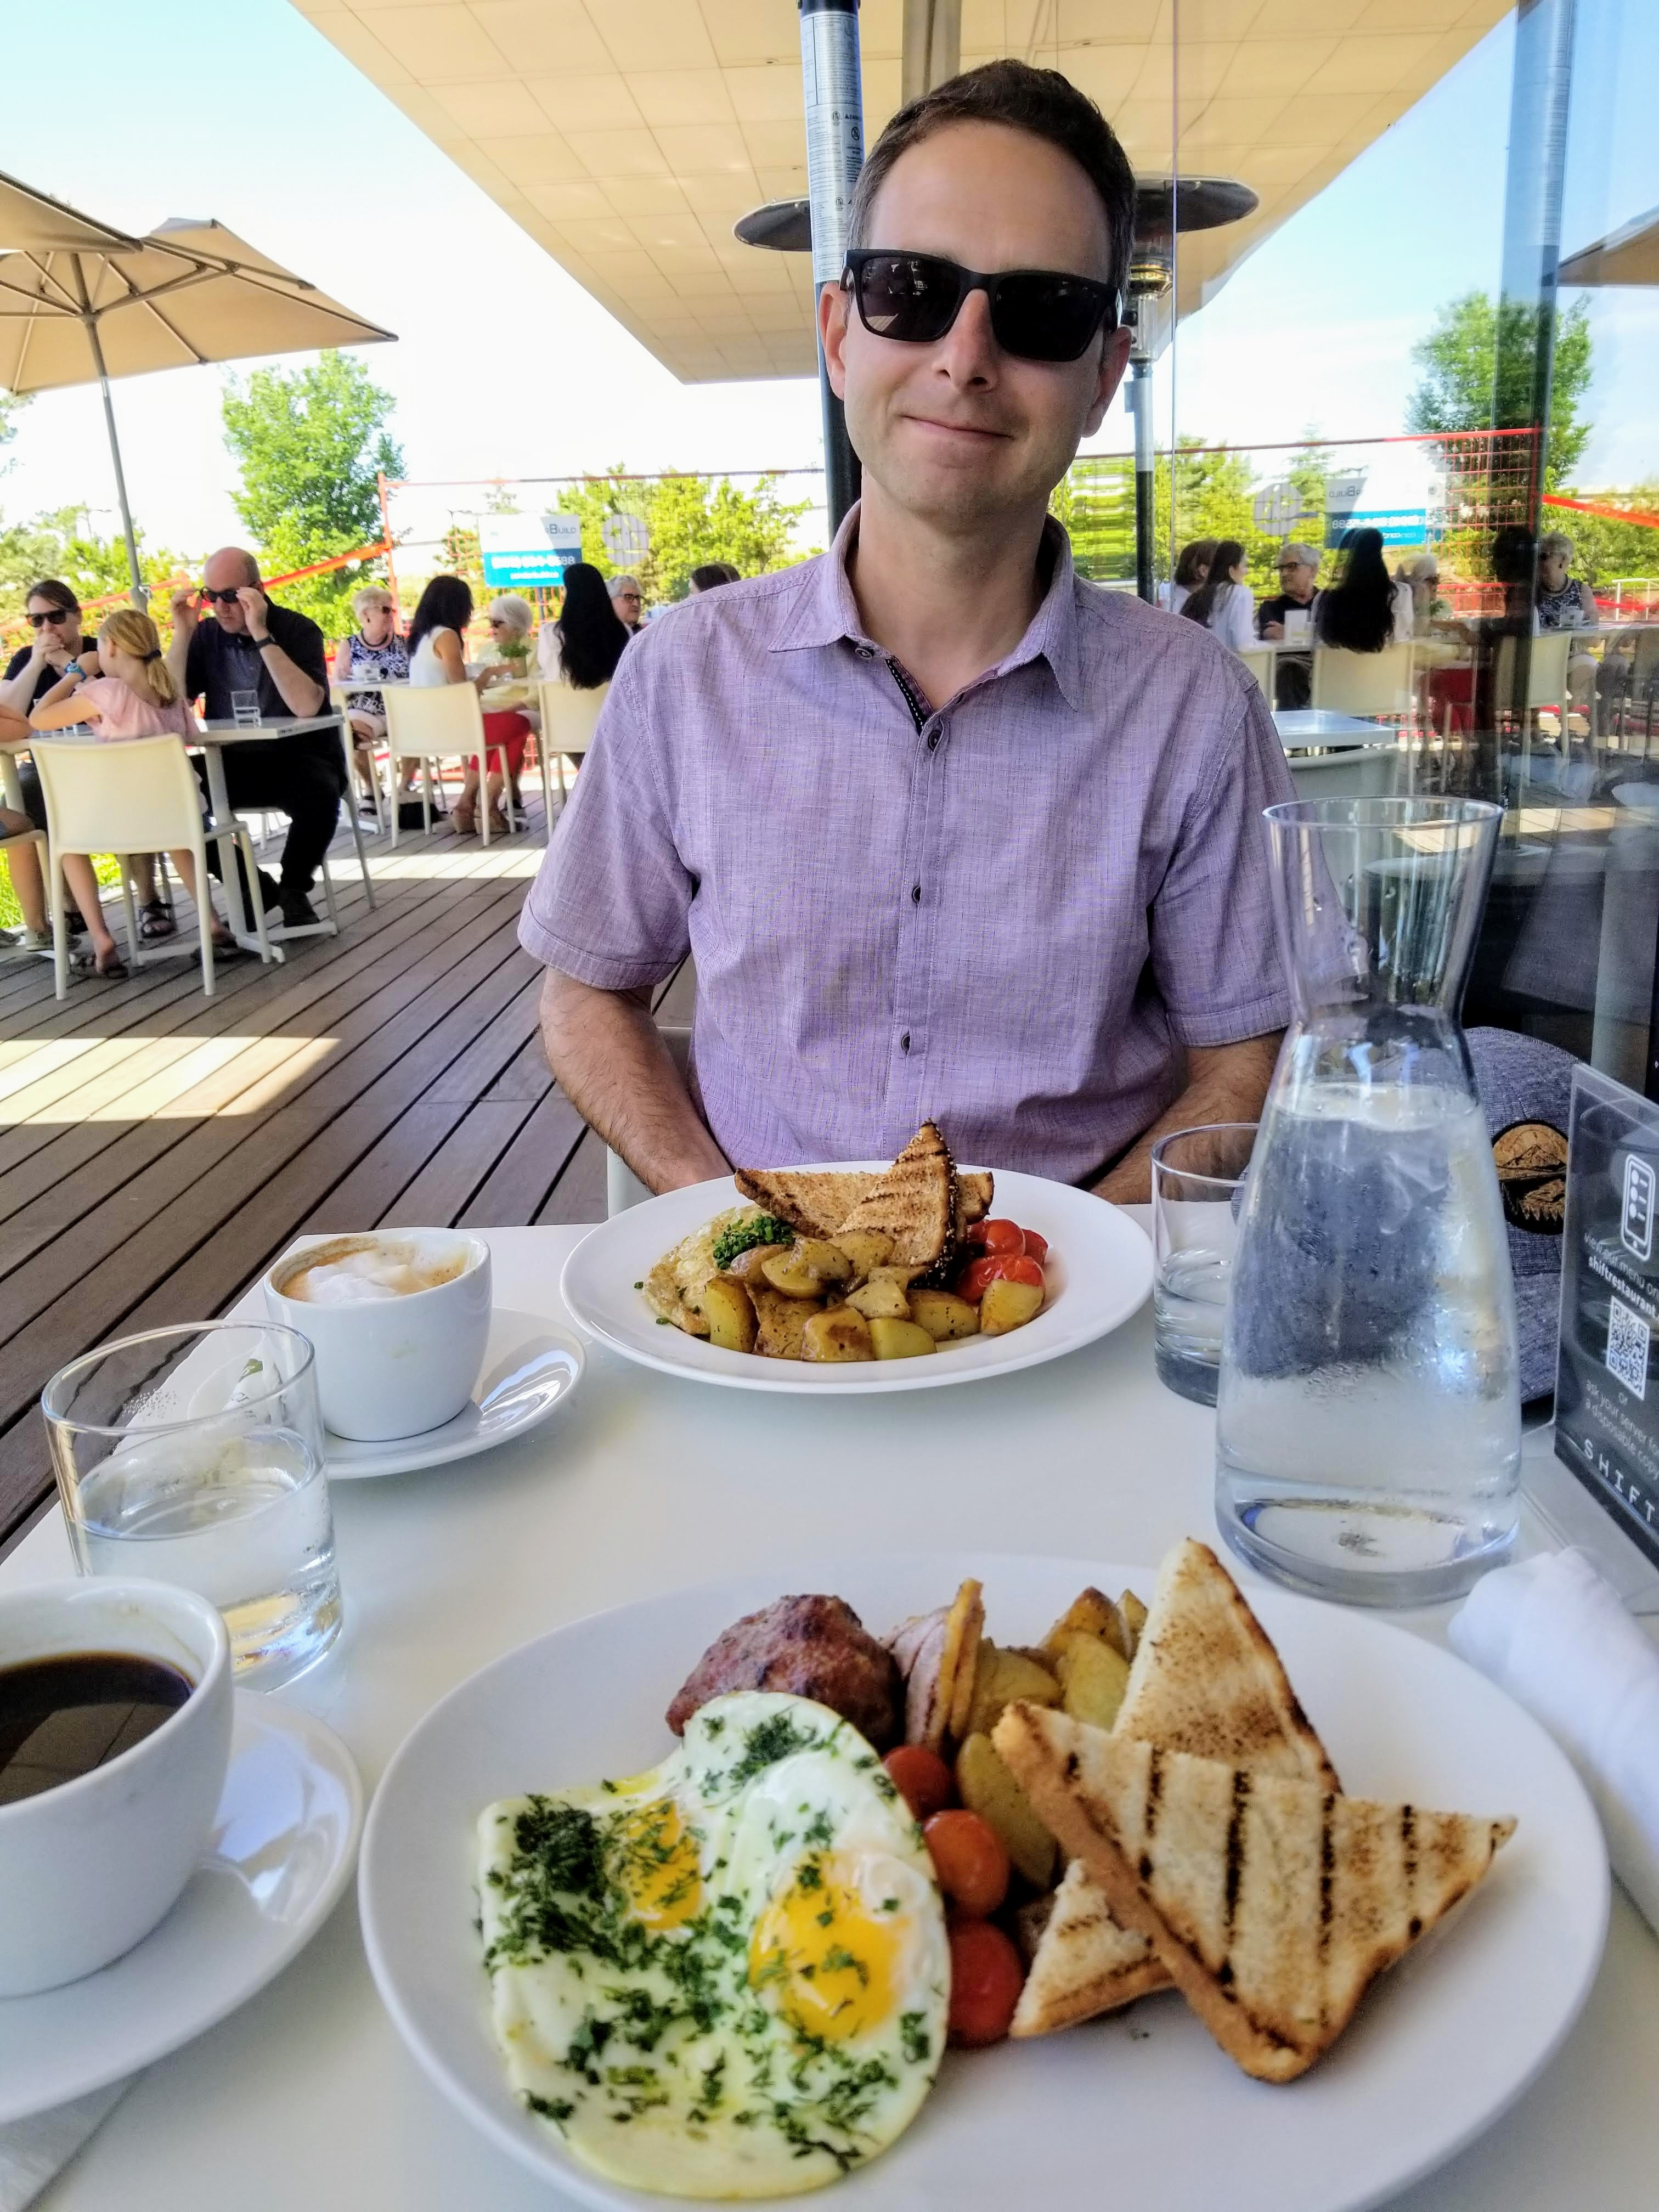 Brunch at Shift Restaurant before exploring the Remai Modern